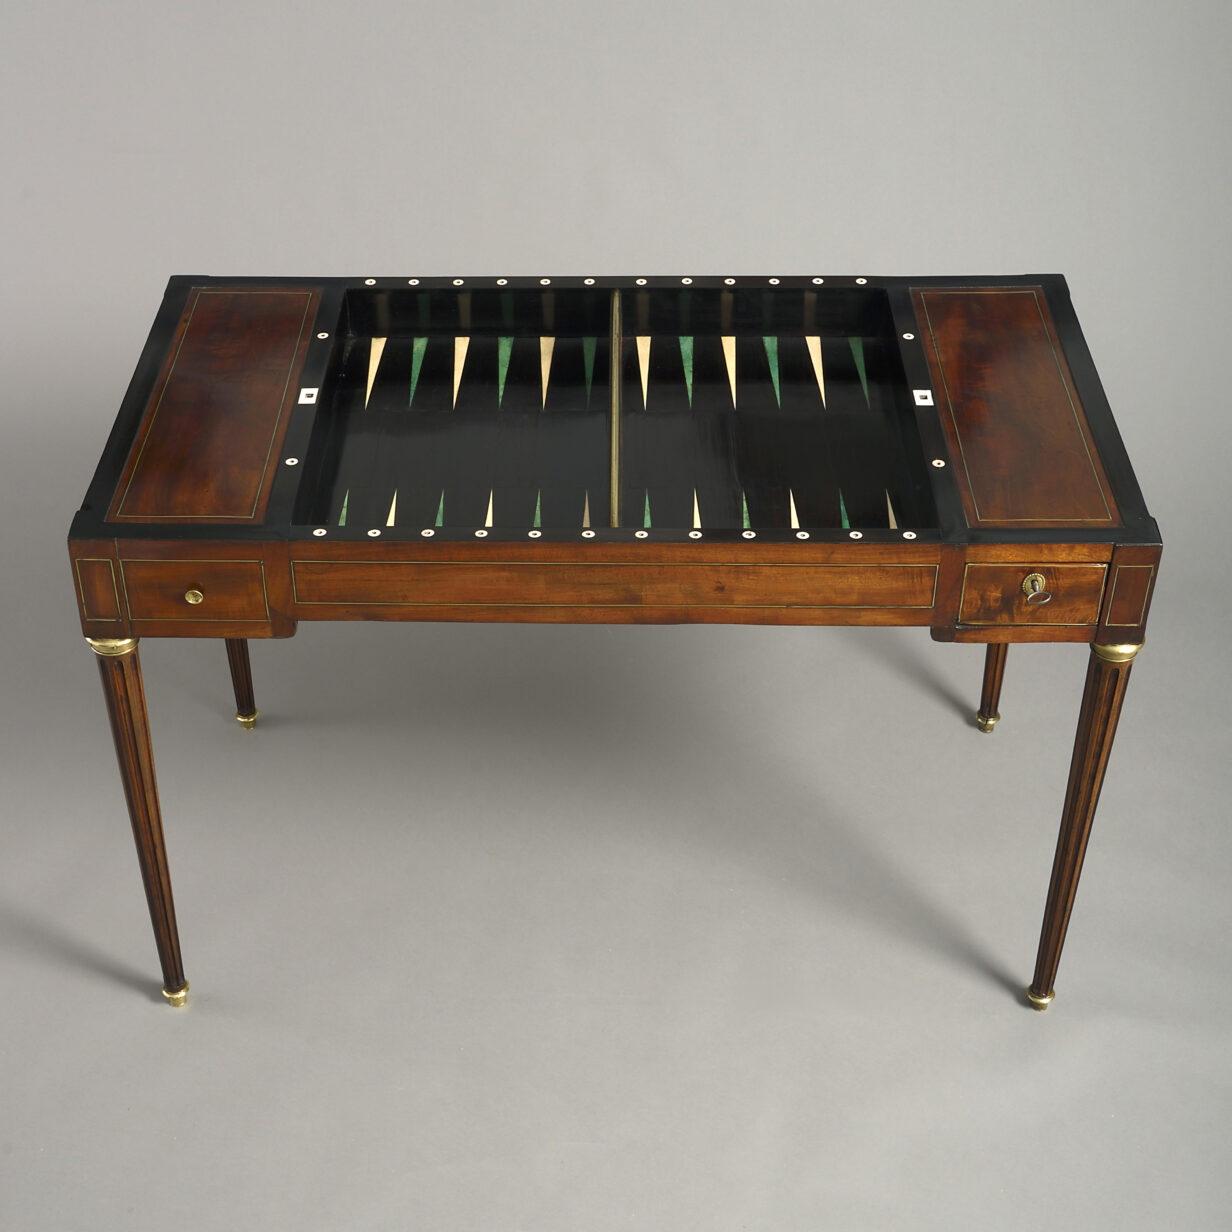 Louis XVI Period Tric Trac Games Table